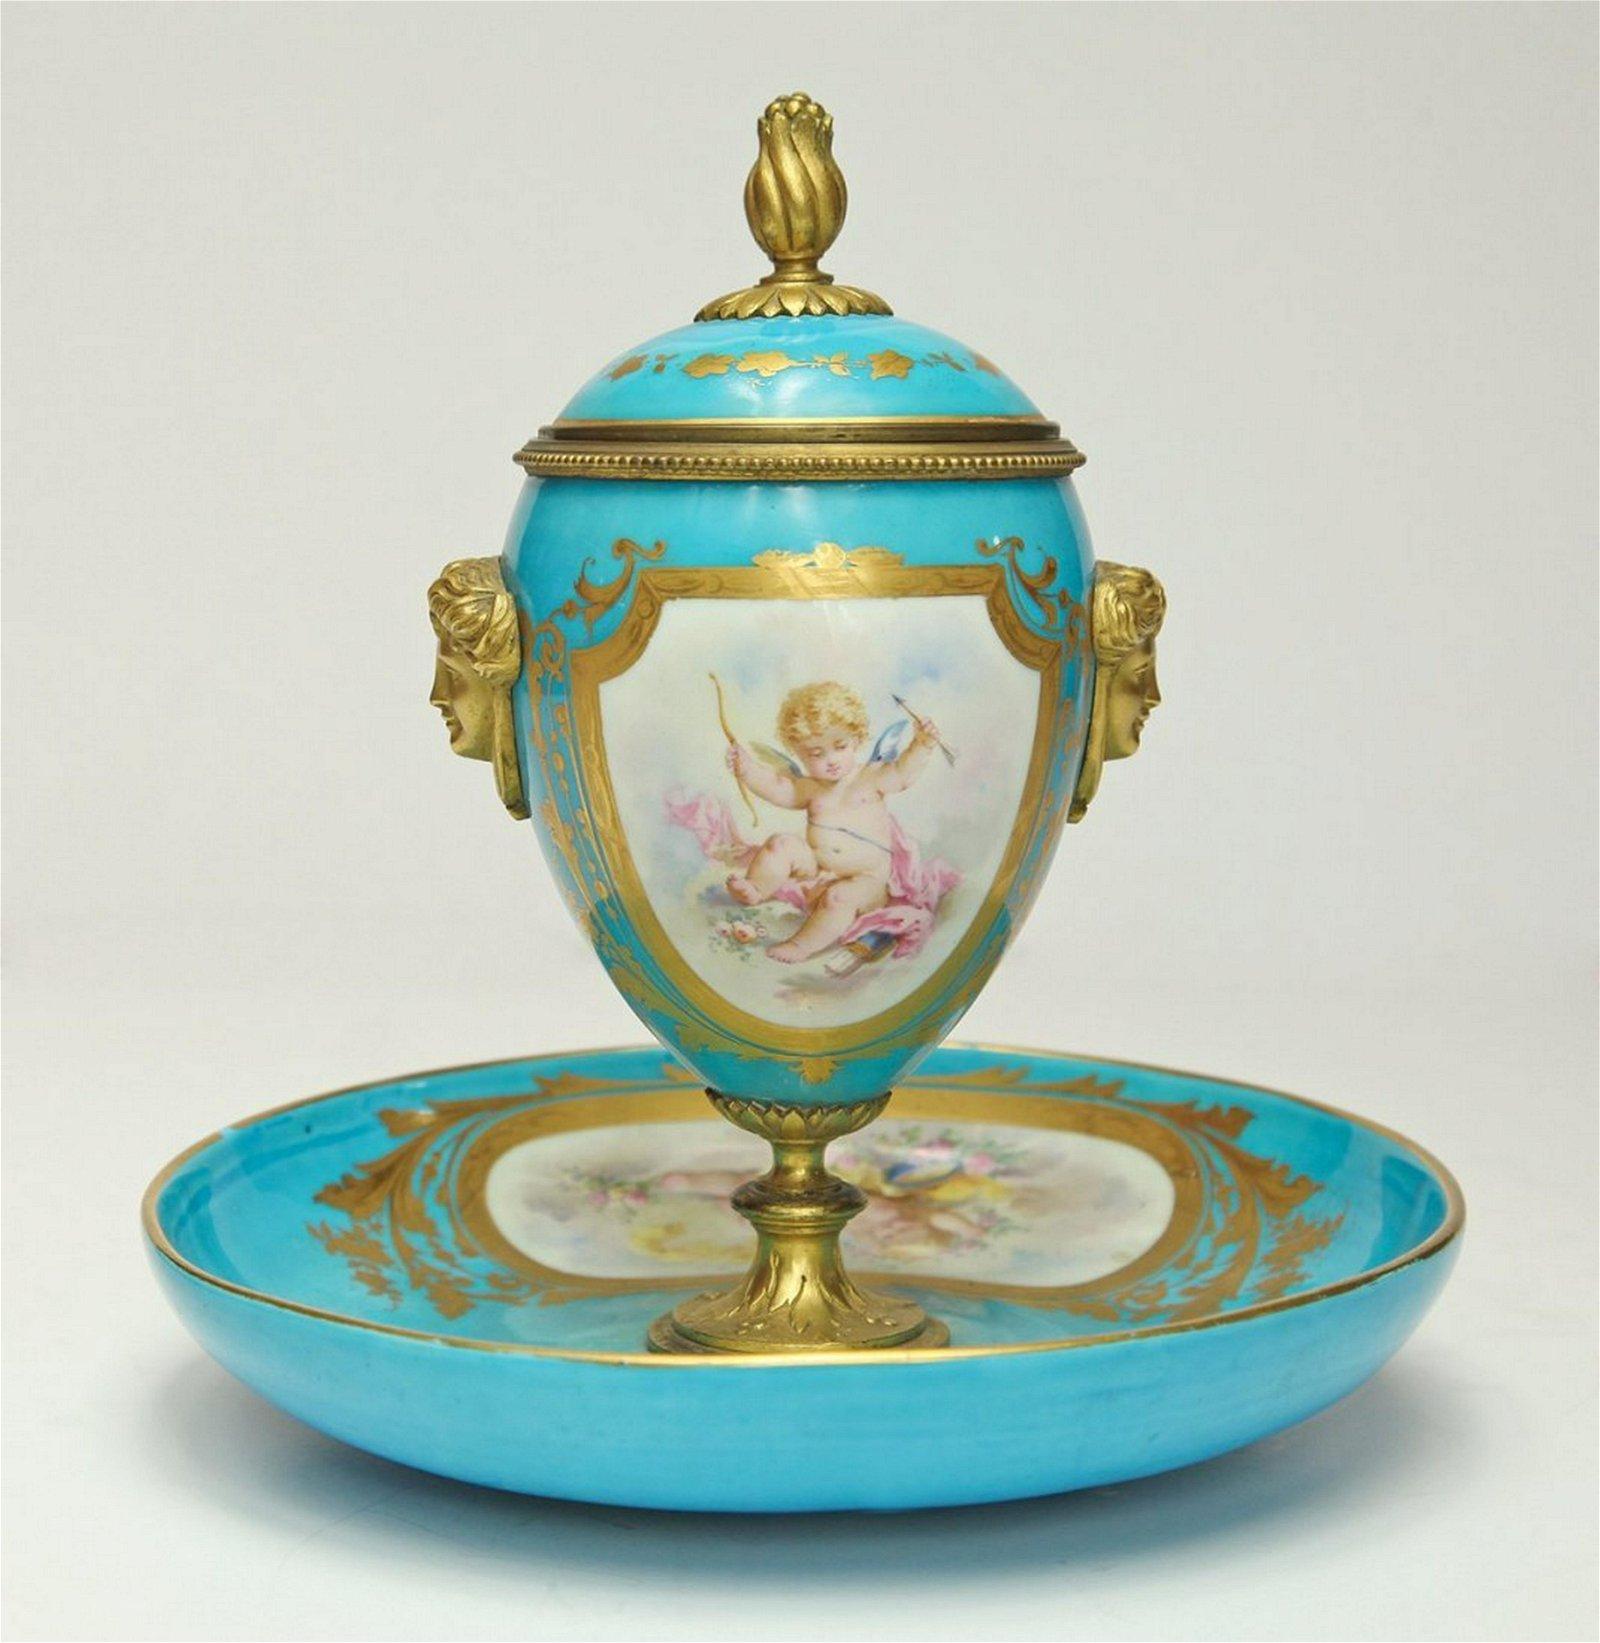 19th C. French Sevres Porcelain & Bronze Urn